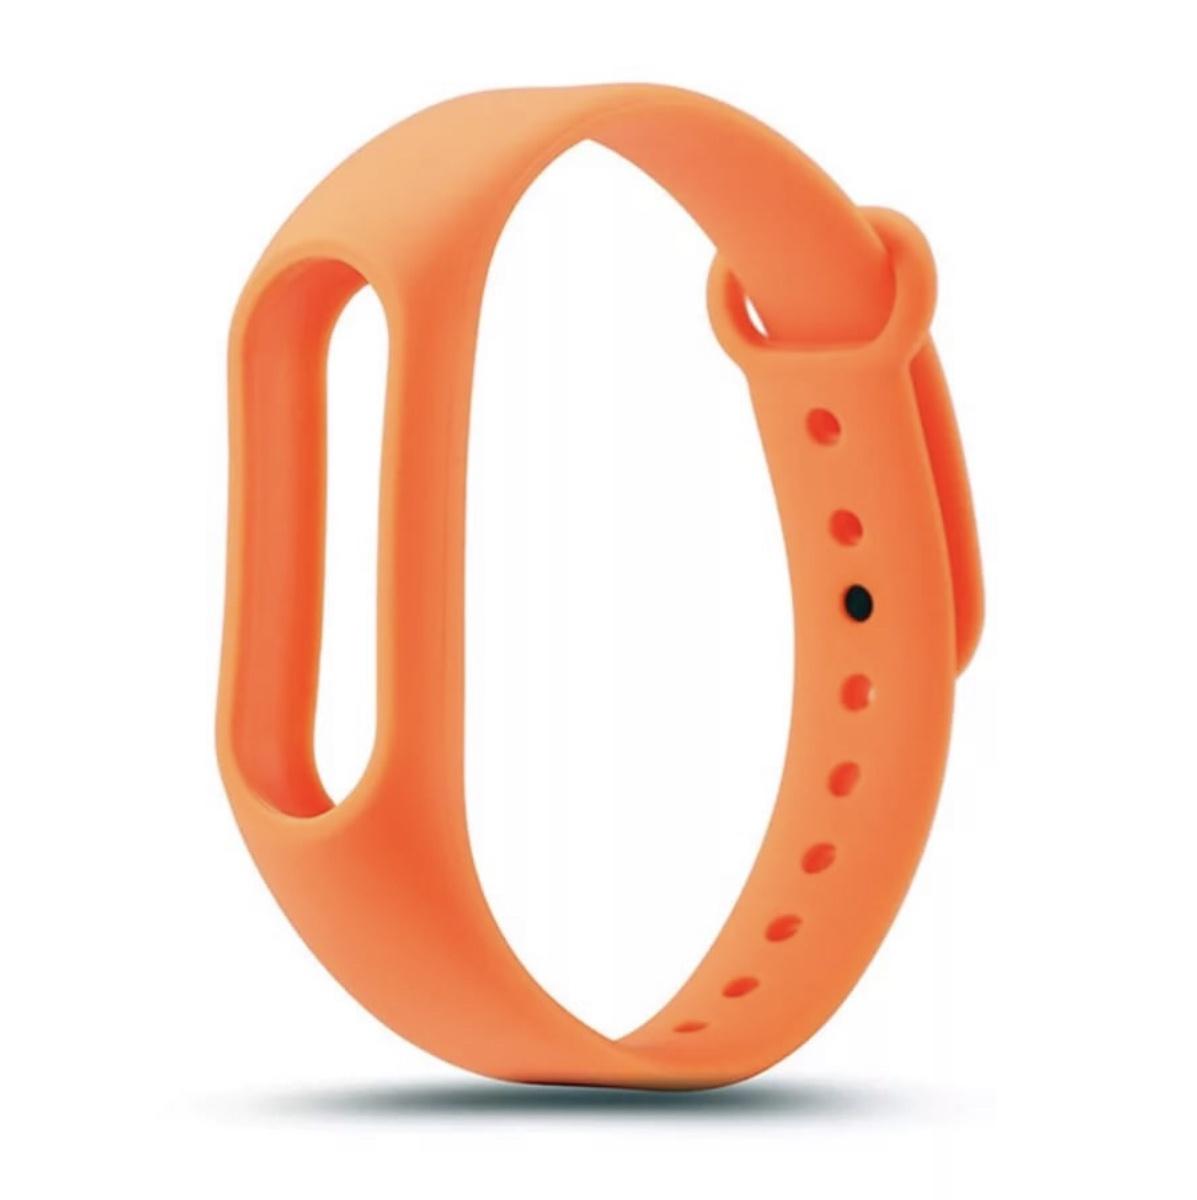 Ремешок для смарт-часов Markclub@Xiaomi Ремешок xiaomi mi band 3 , mi band 3 оранжевый, оранжевый ремешок для смарт часов sadko xiaomi mi band 2 7 4605181034460